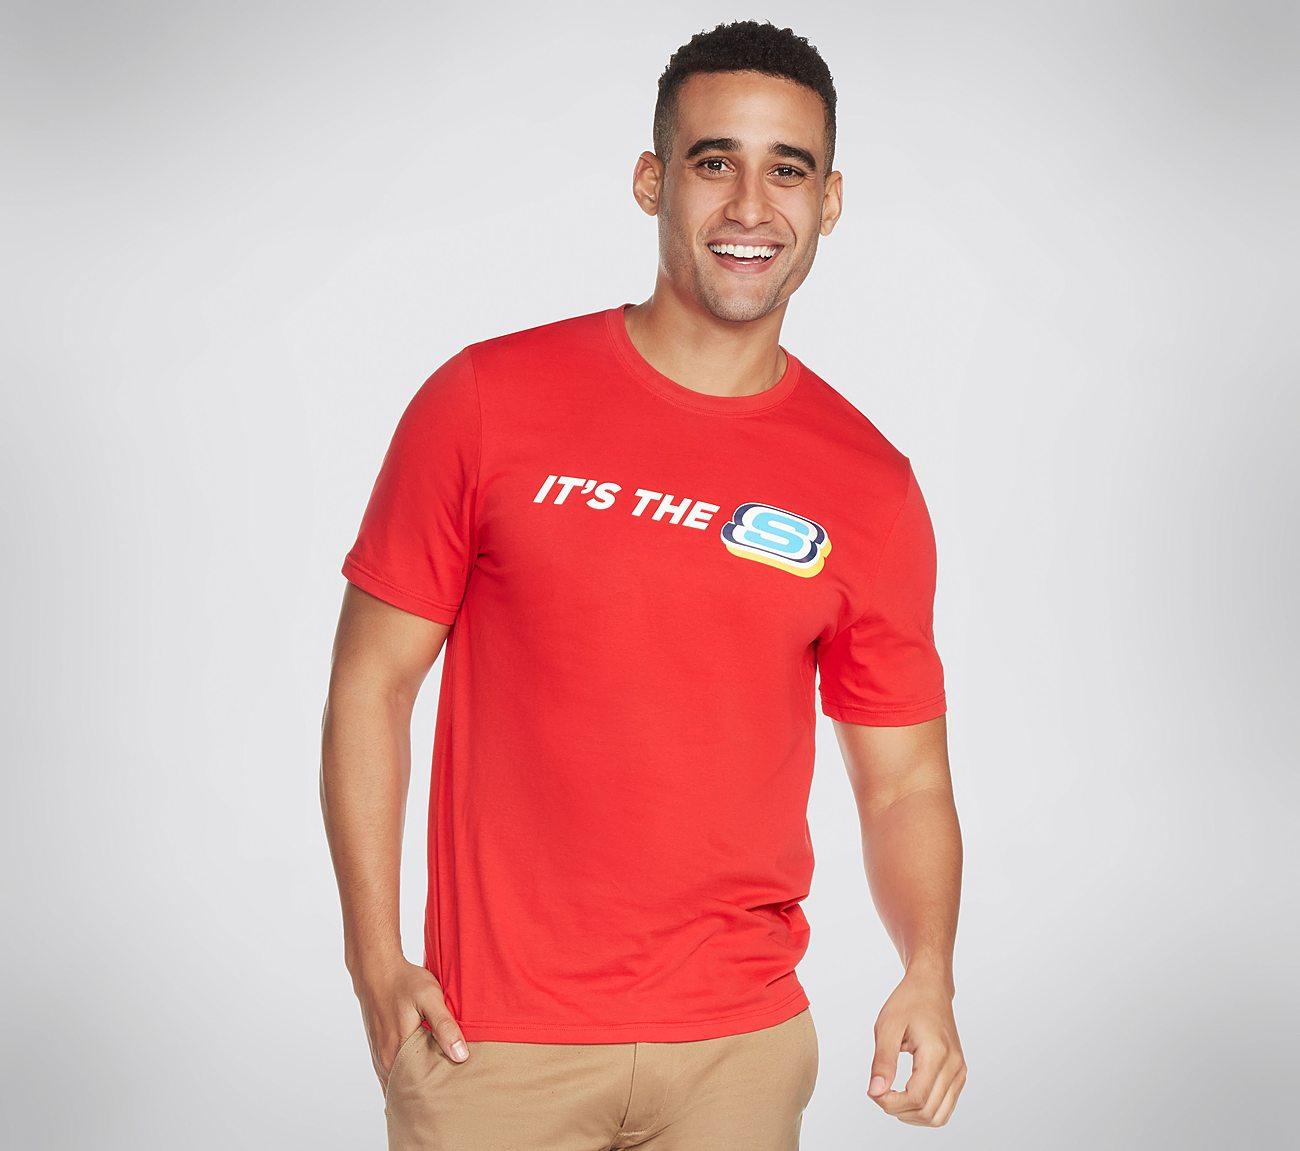 Skechers Apparel It's The S Tee Shirt